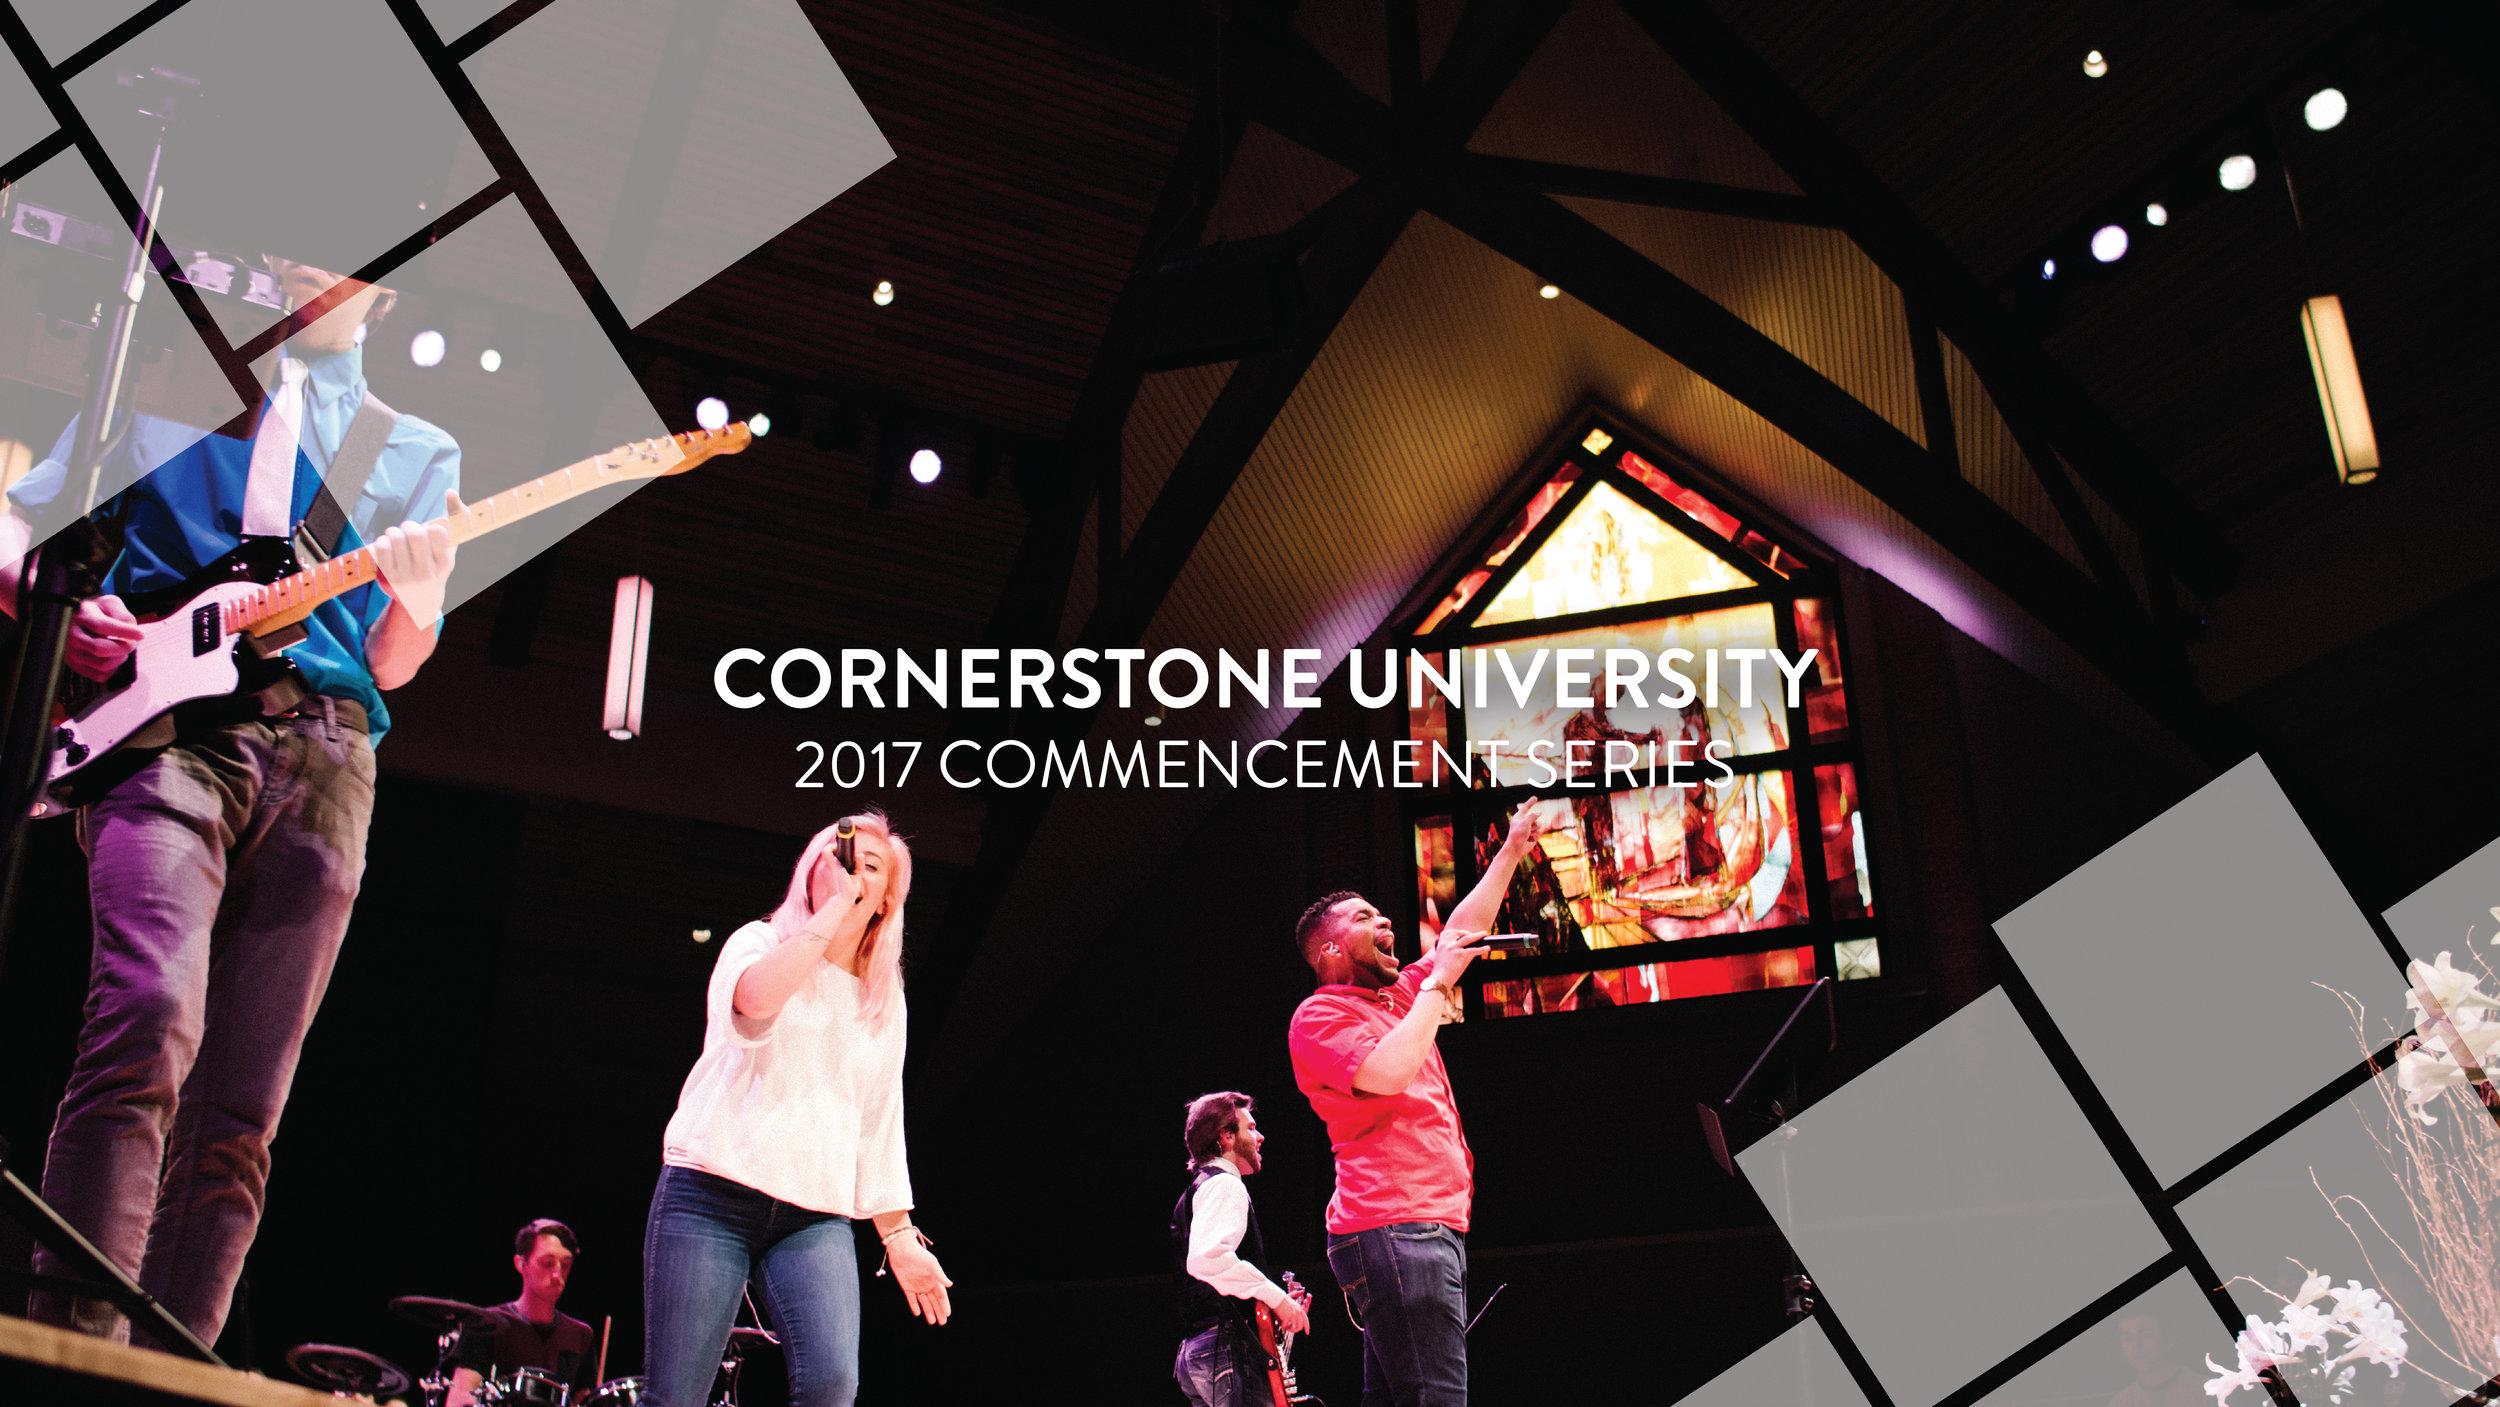 Cornerstone-University-Grand-Rapids-2017-Commencement-Corporate-Film-Series